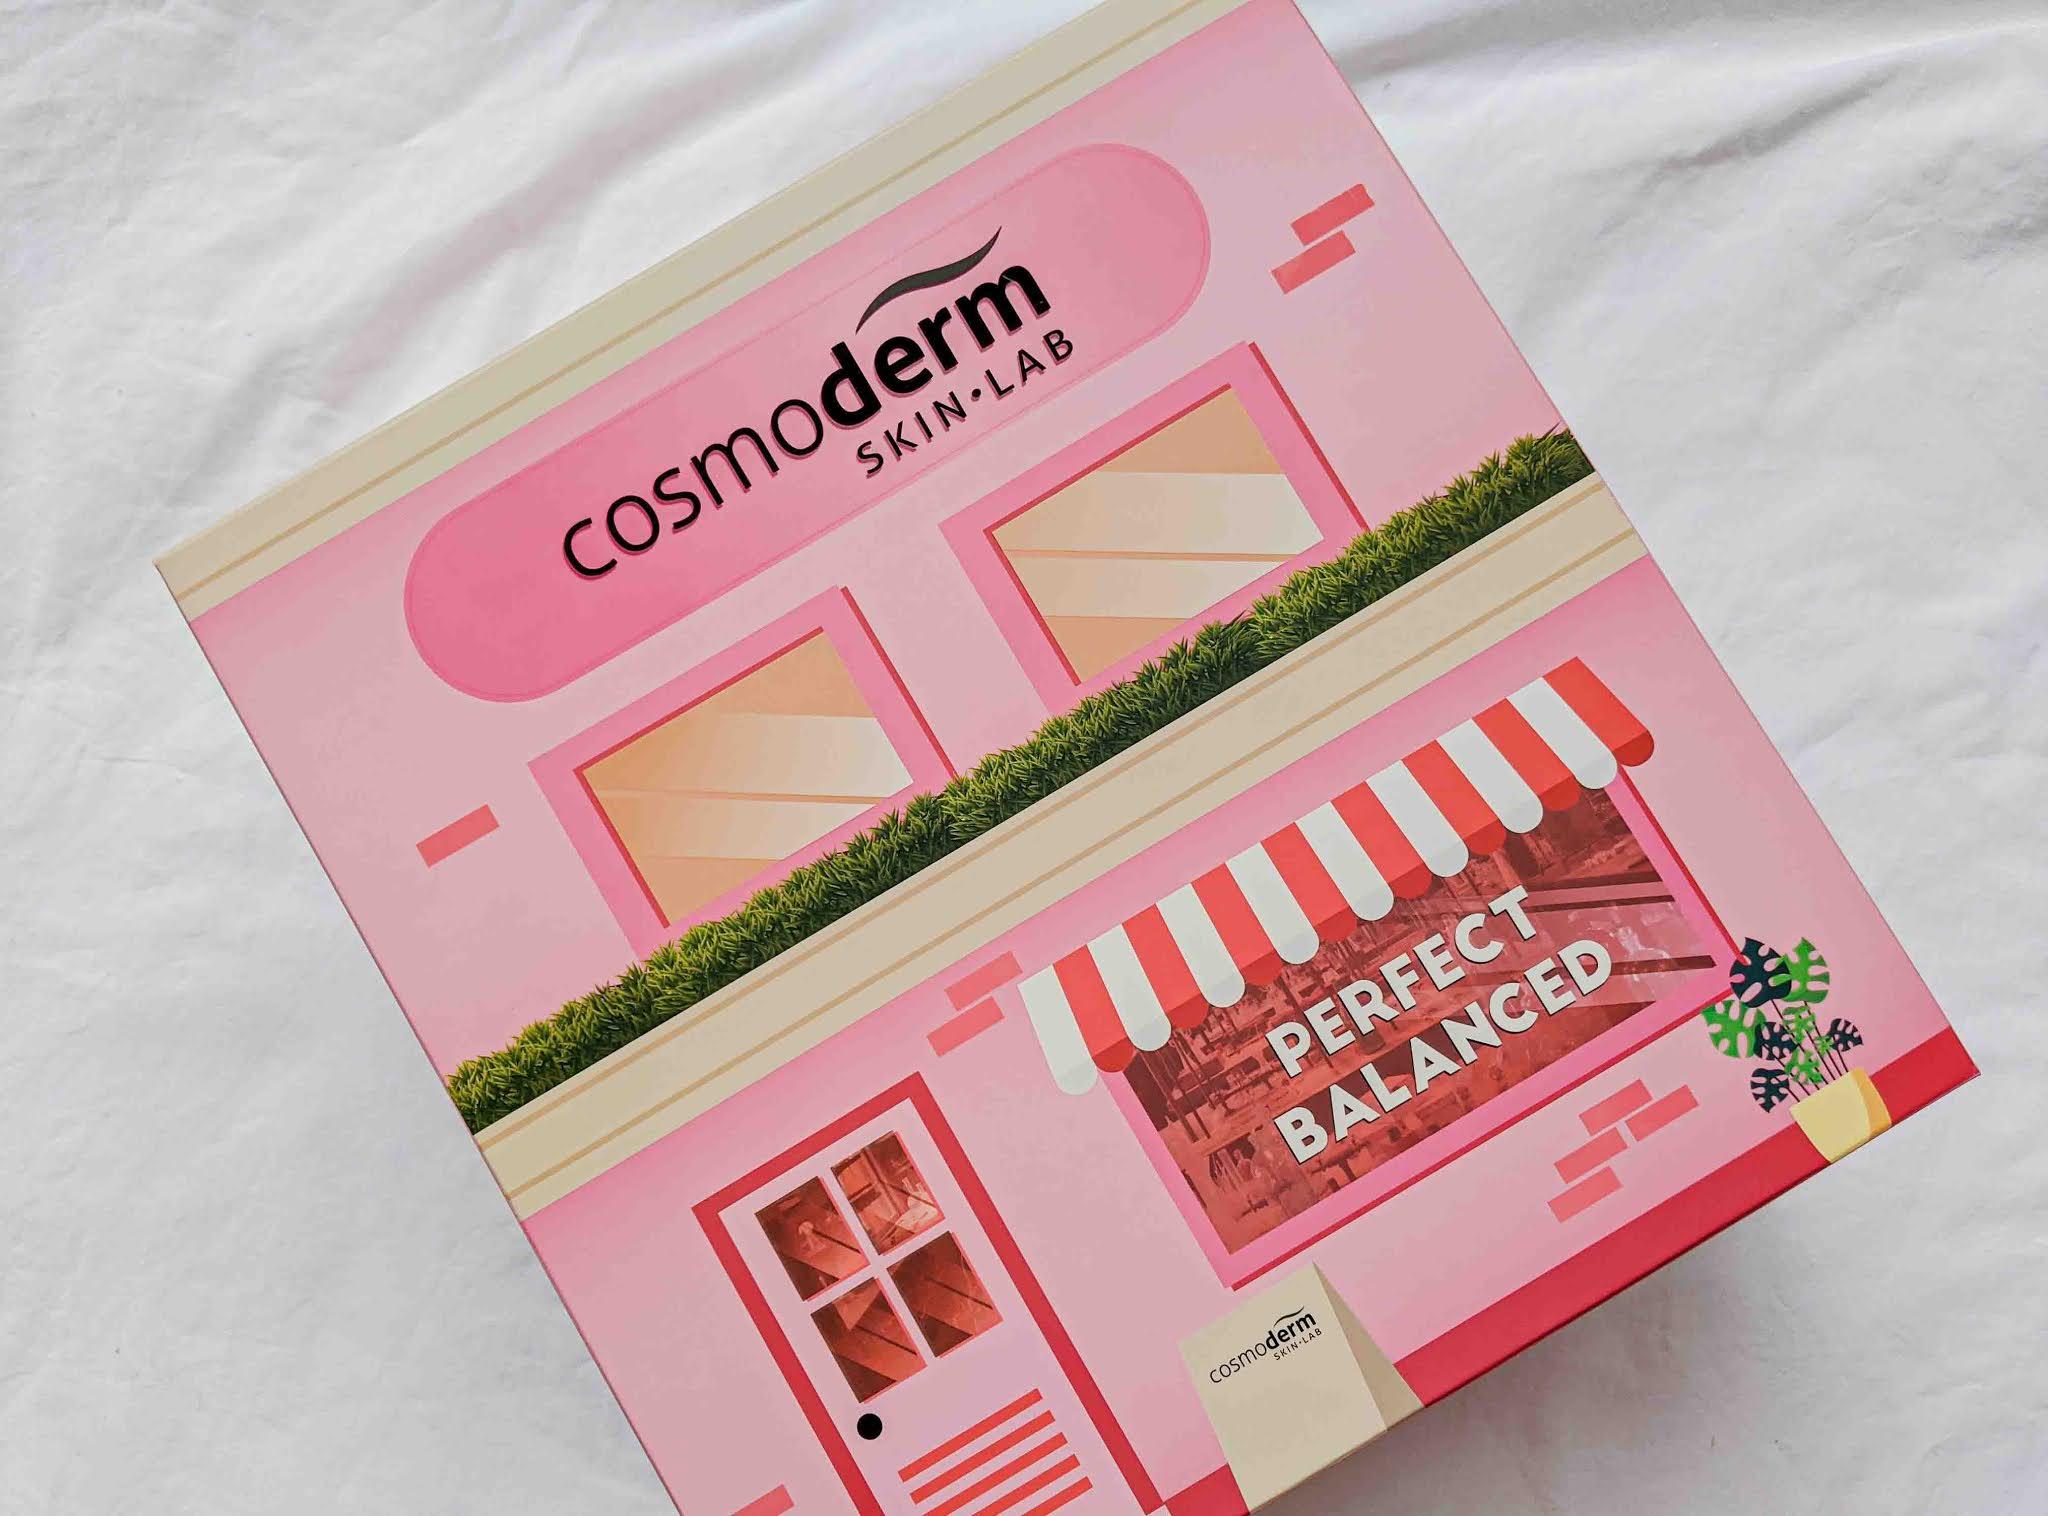 Cosmoderm Perfect Balanced : Set Penjagaan Wajah Terbaru Dari Cosmoderm